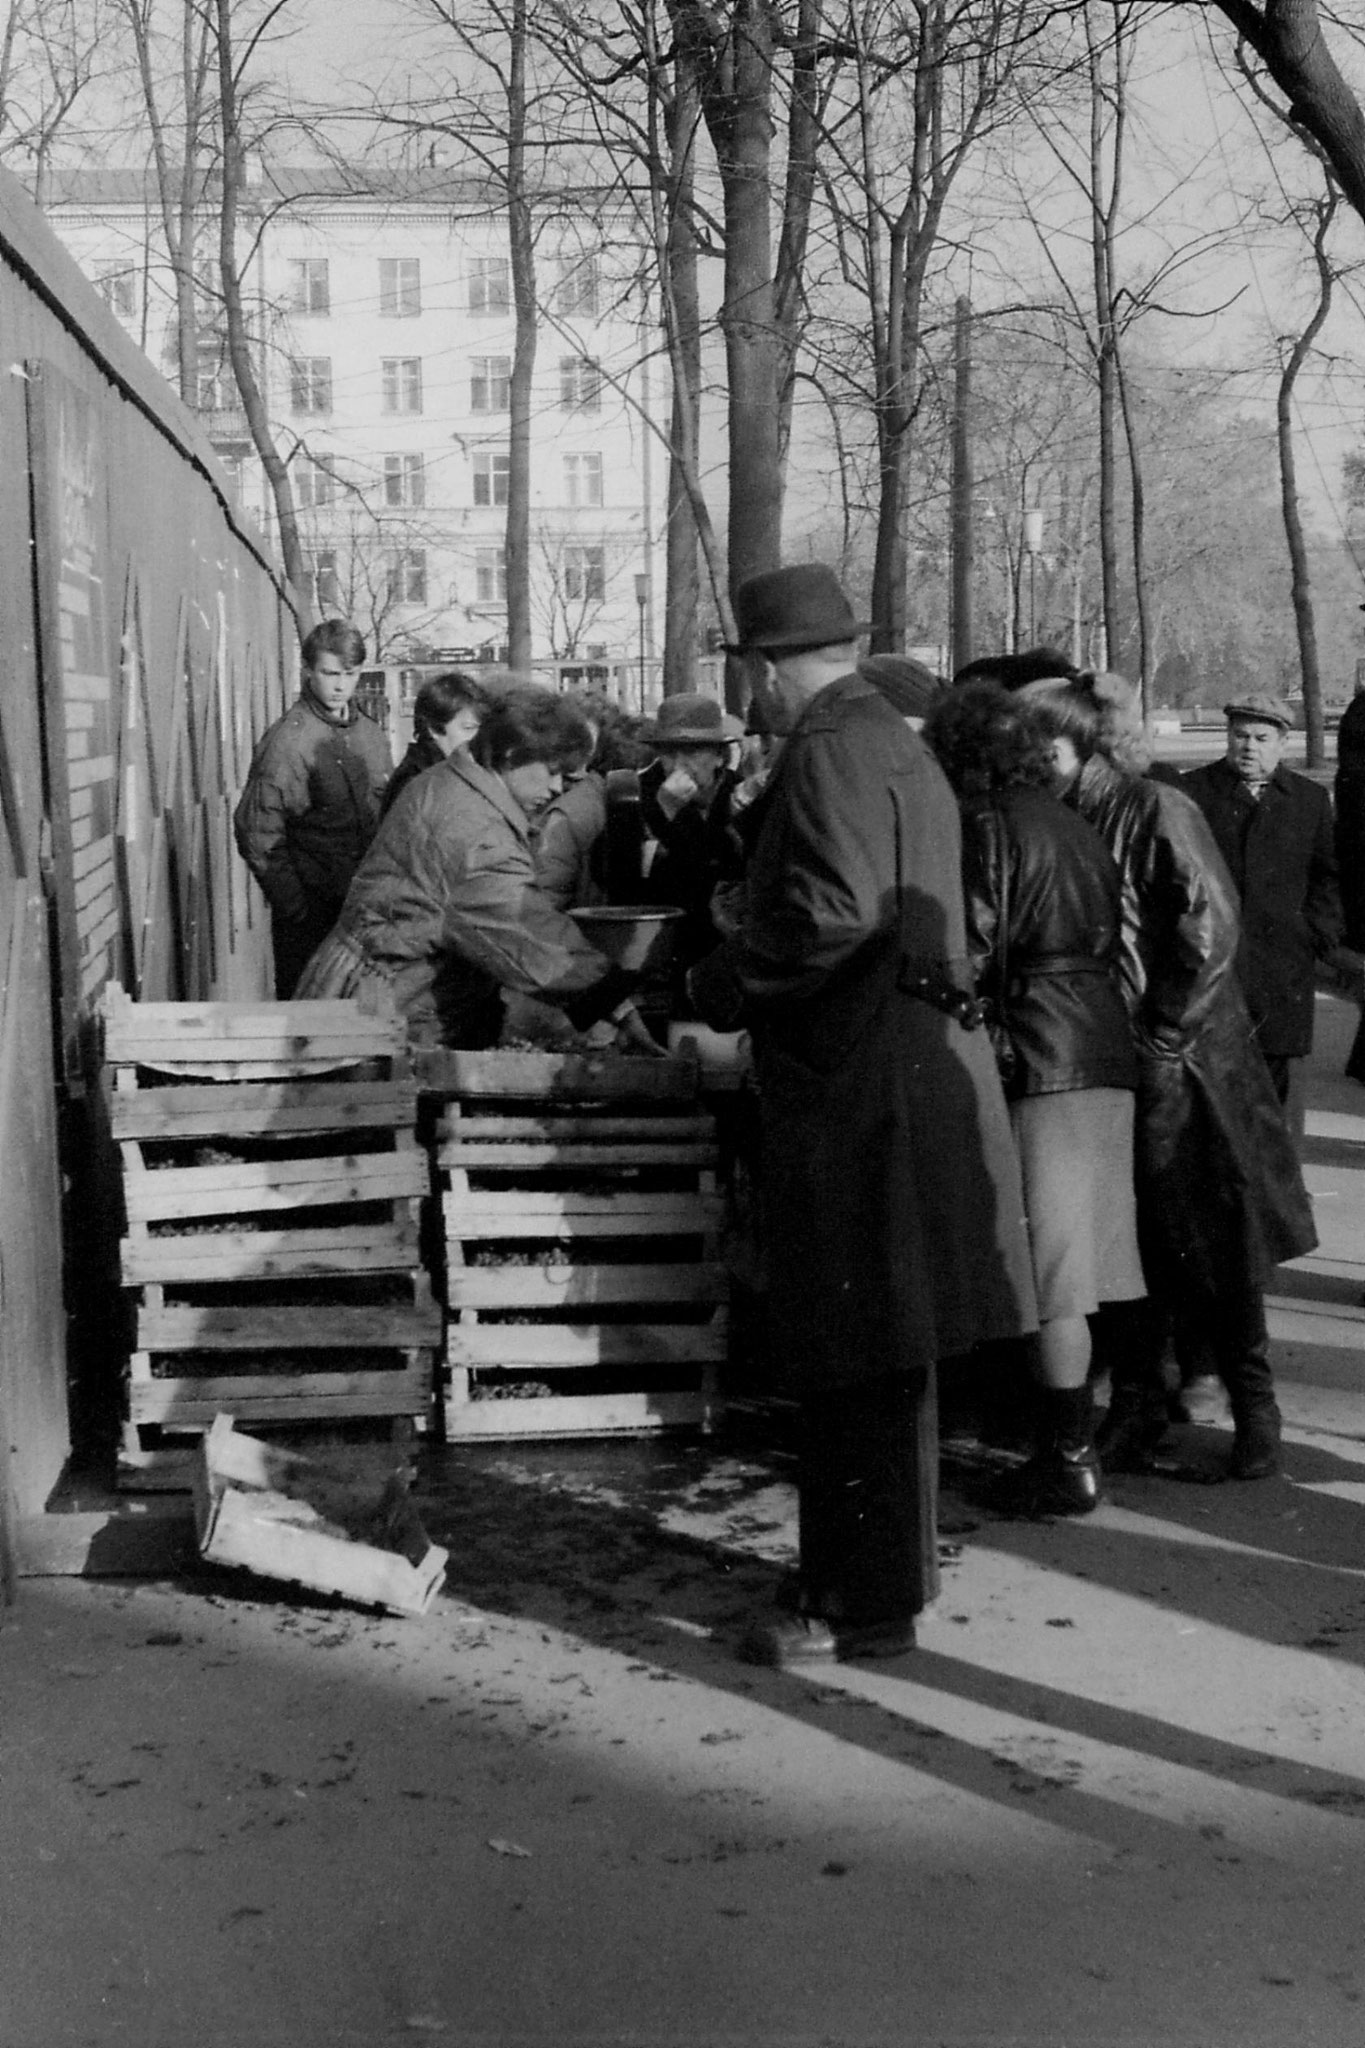 14/10/1988: 21: grapes and lemons stall outside Metro